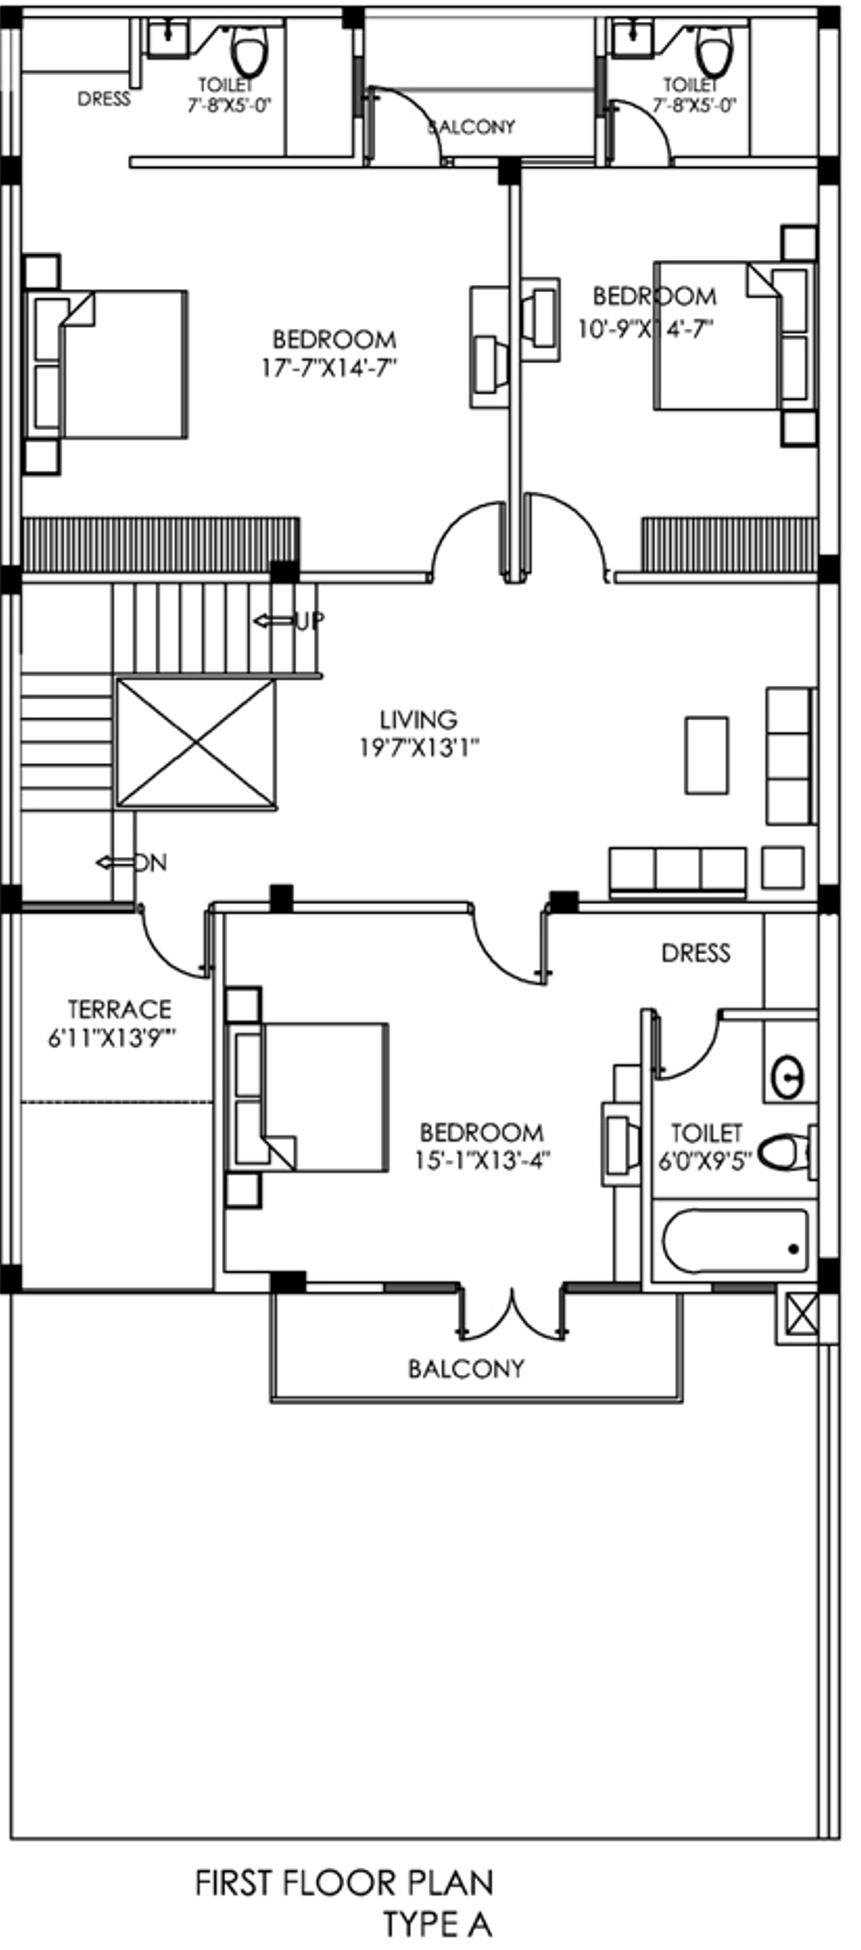 Assotech Windsor Hills Signature Villa In City Centre